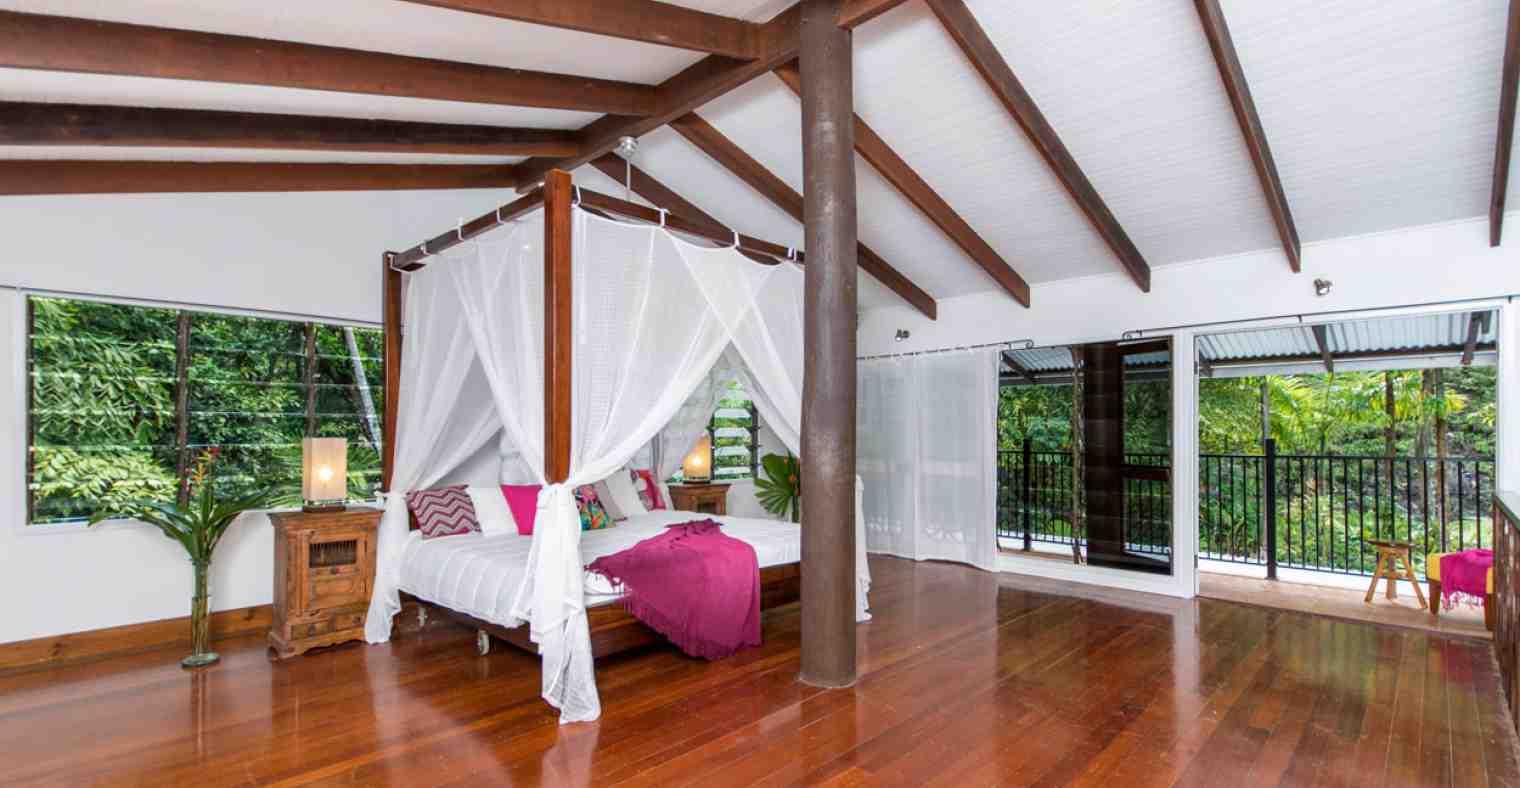 The mountain view room - Villa Zena